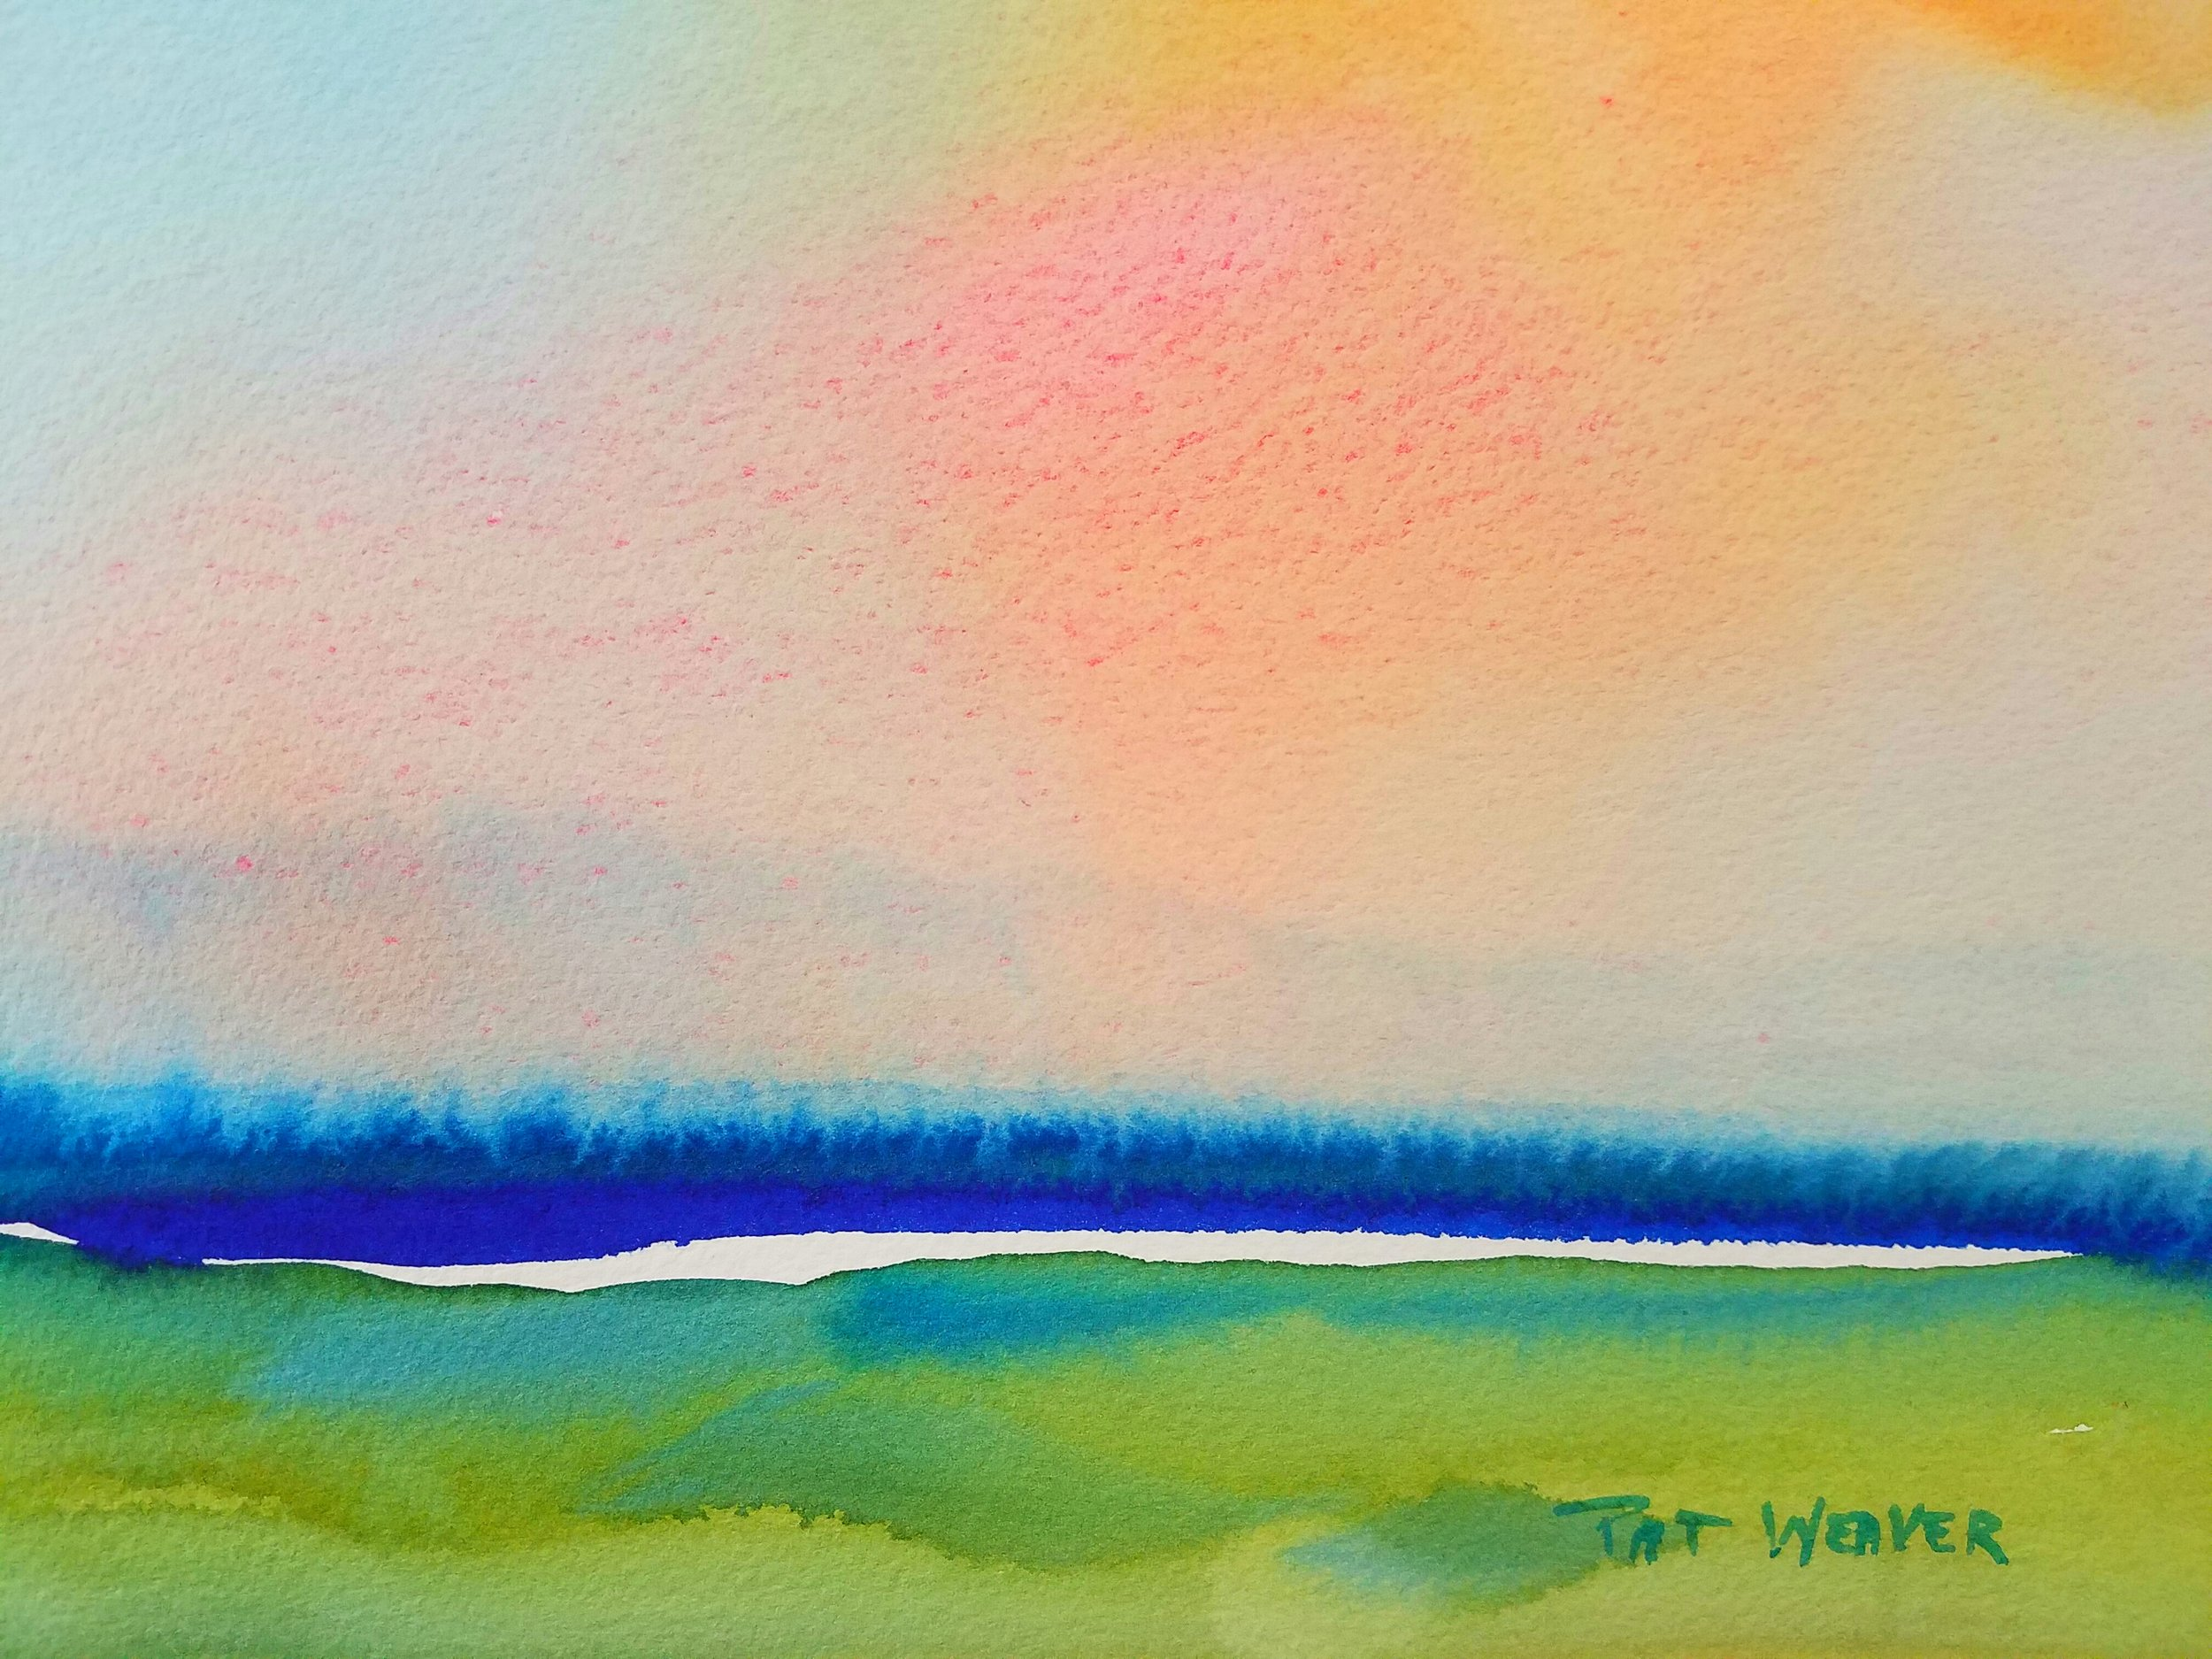 Pat Weaver's Sunrise